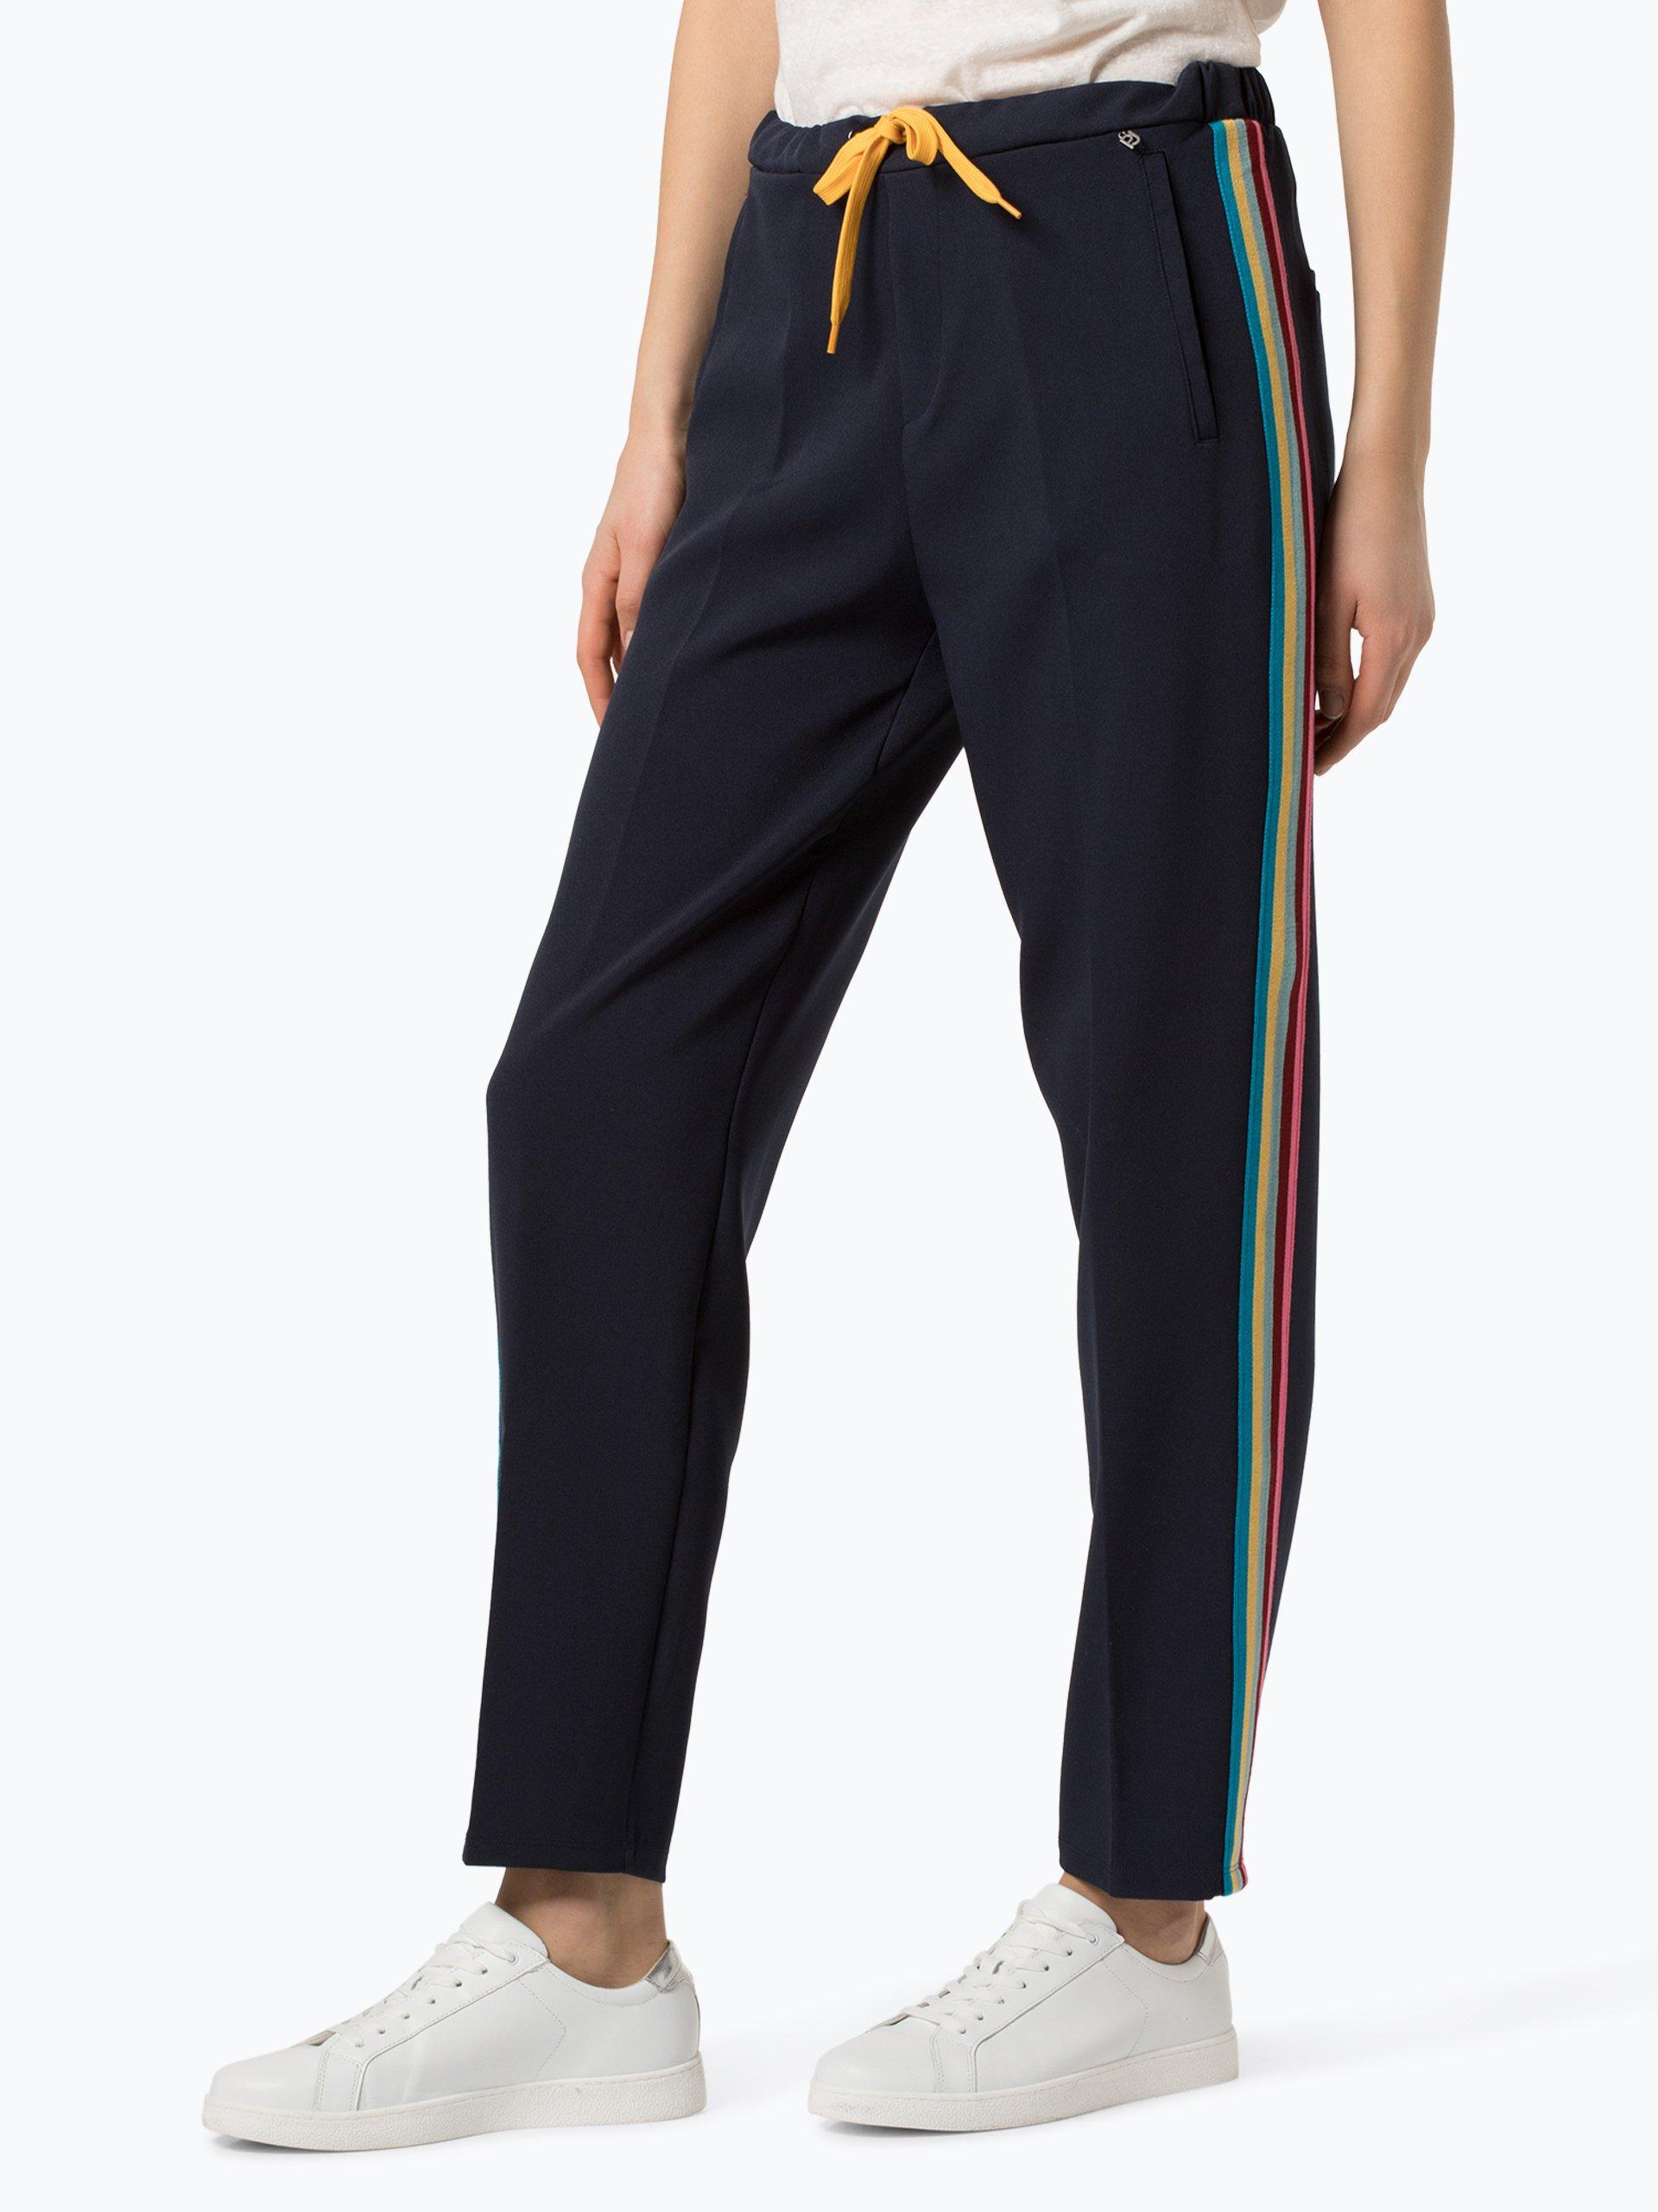 Pepe Jeans Damen Hose - Lula